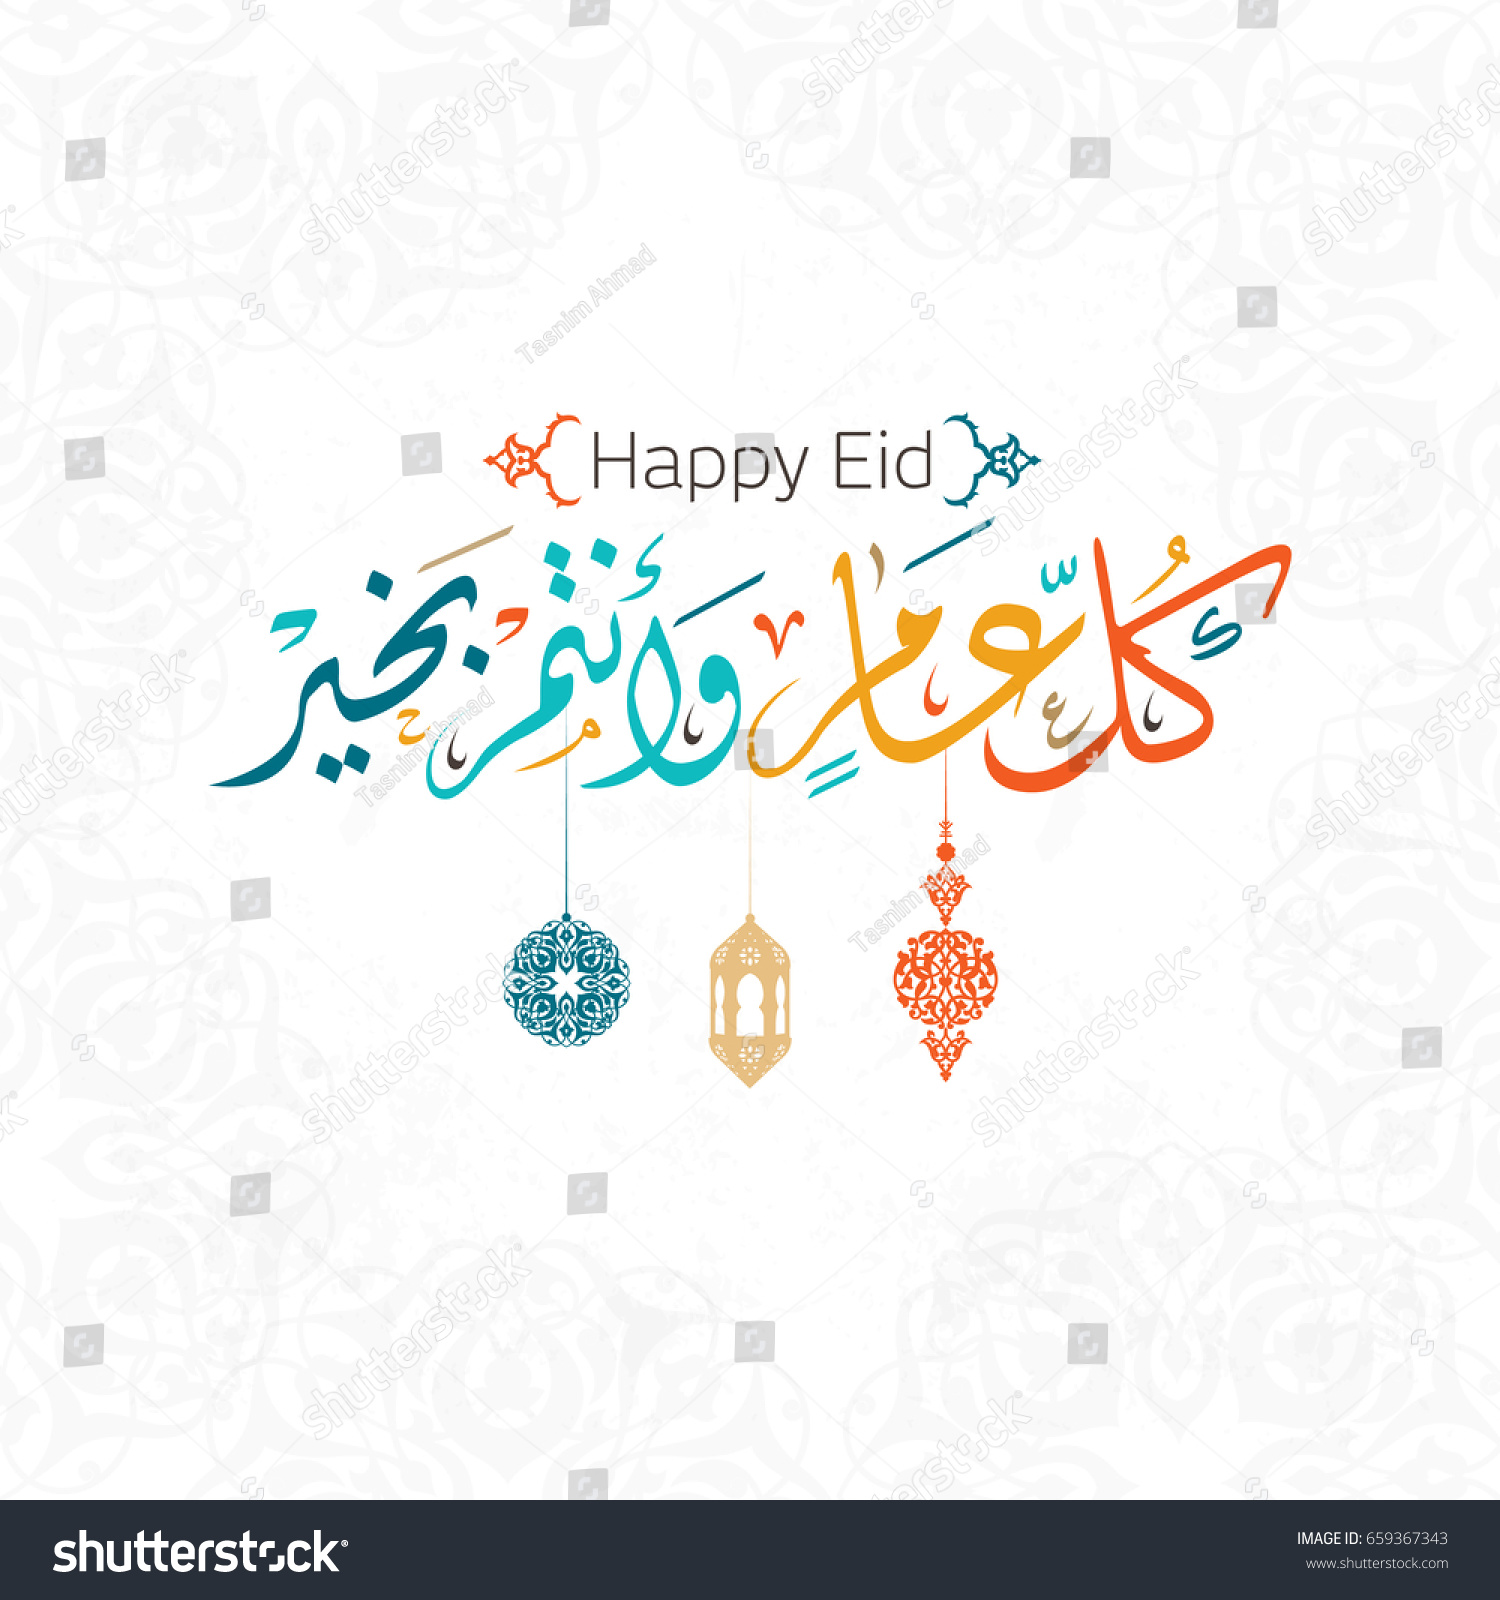 Happy Eid Eid Mubarak Greeting Card Stock Vector Royalty Free